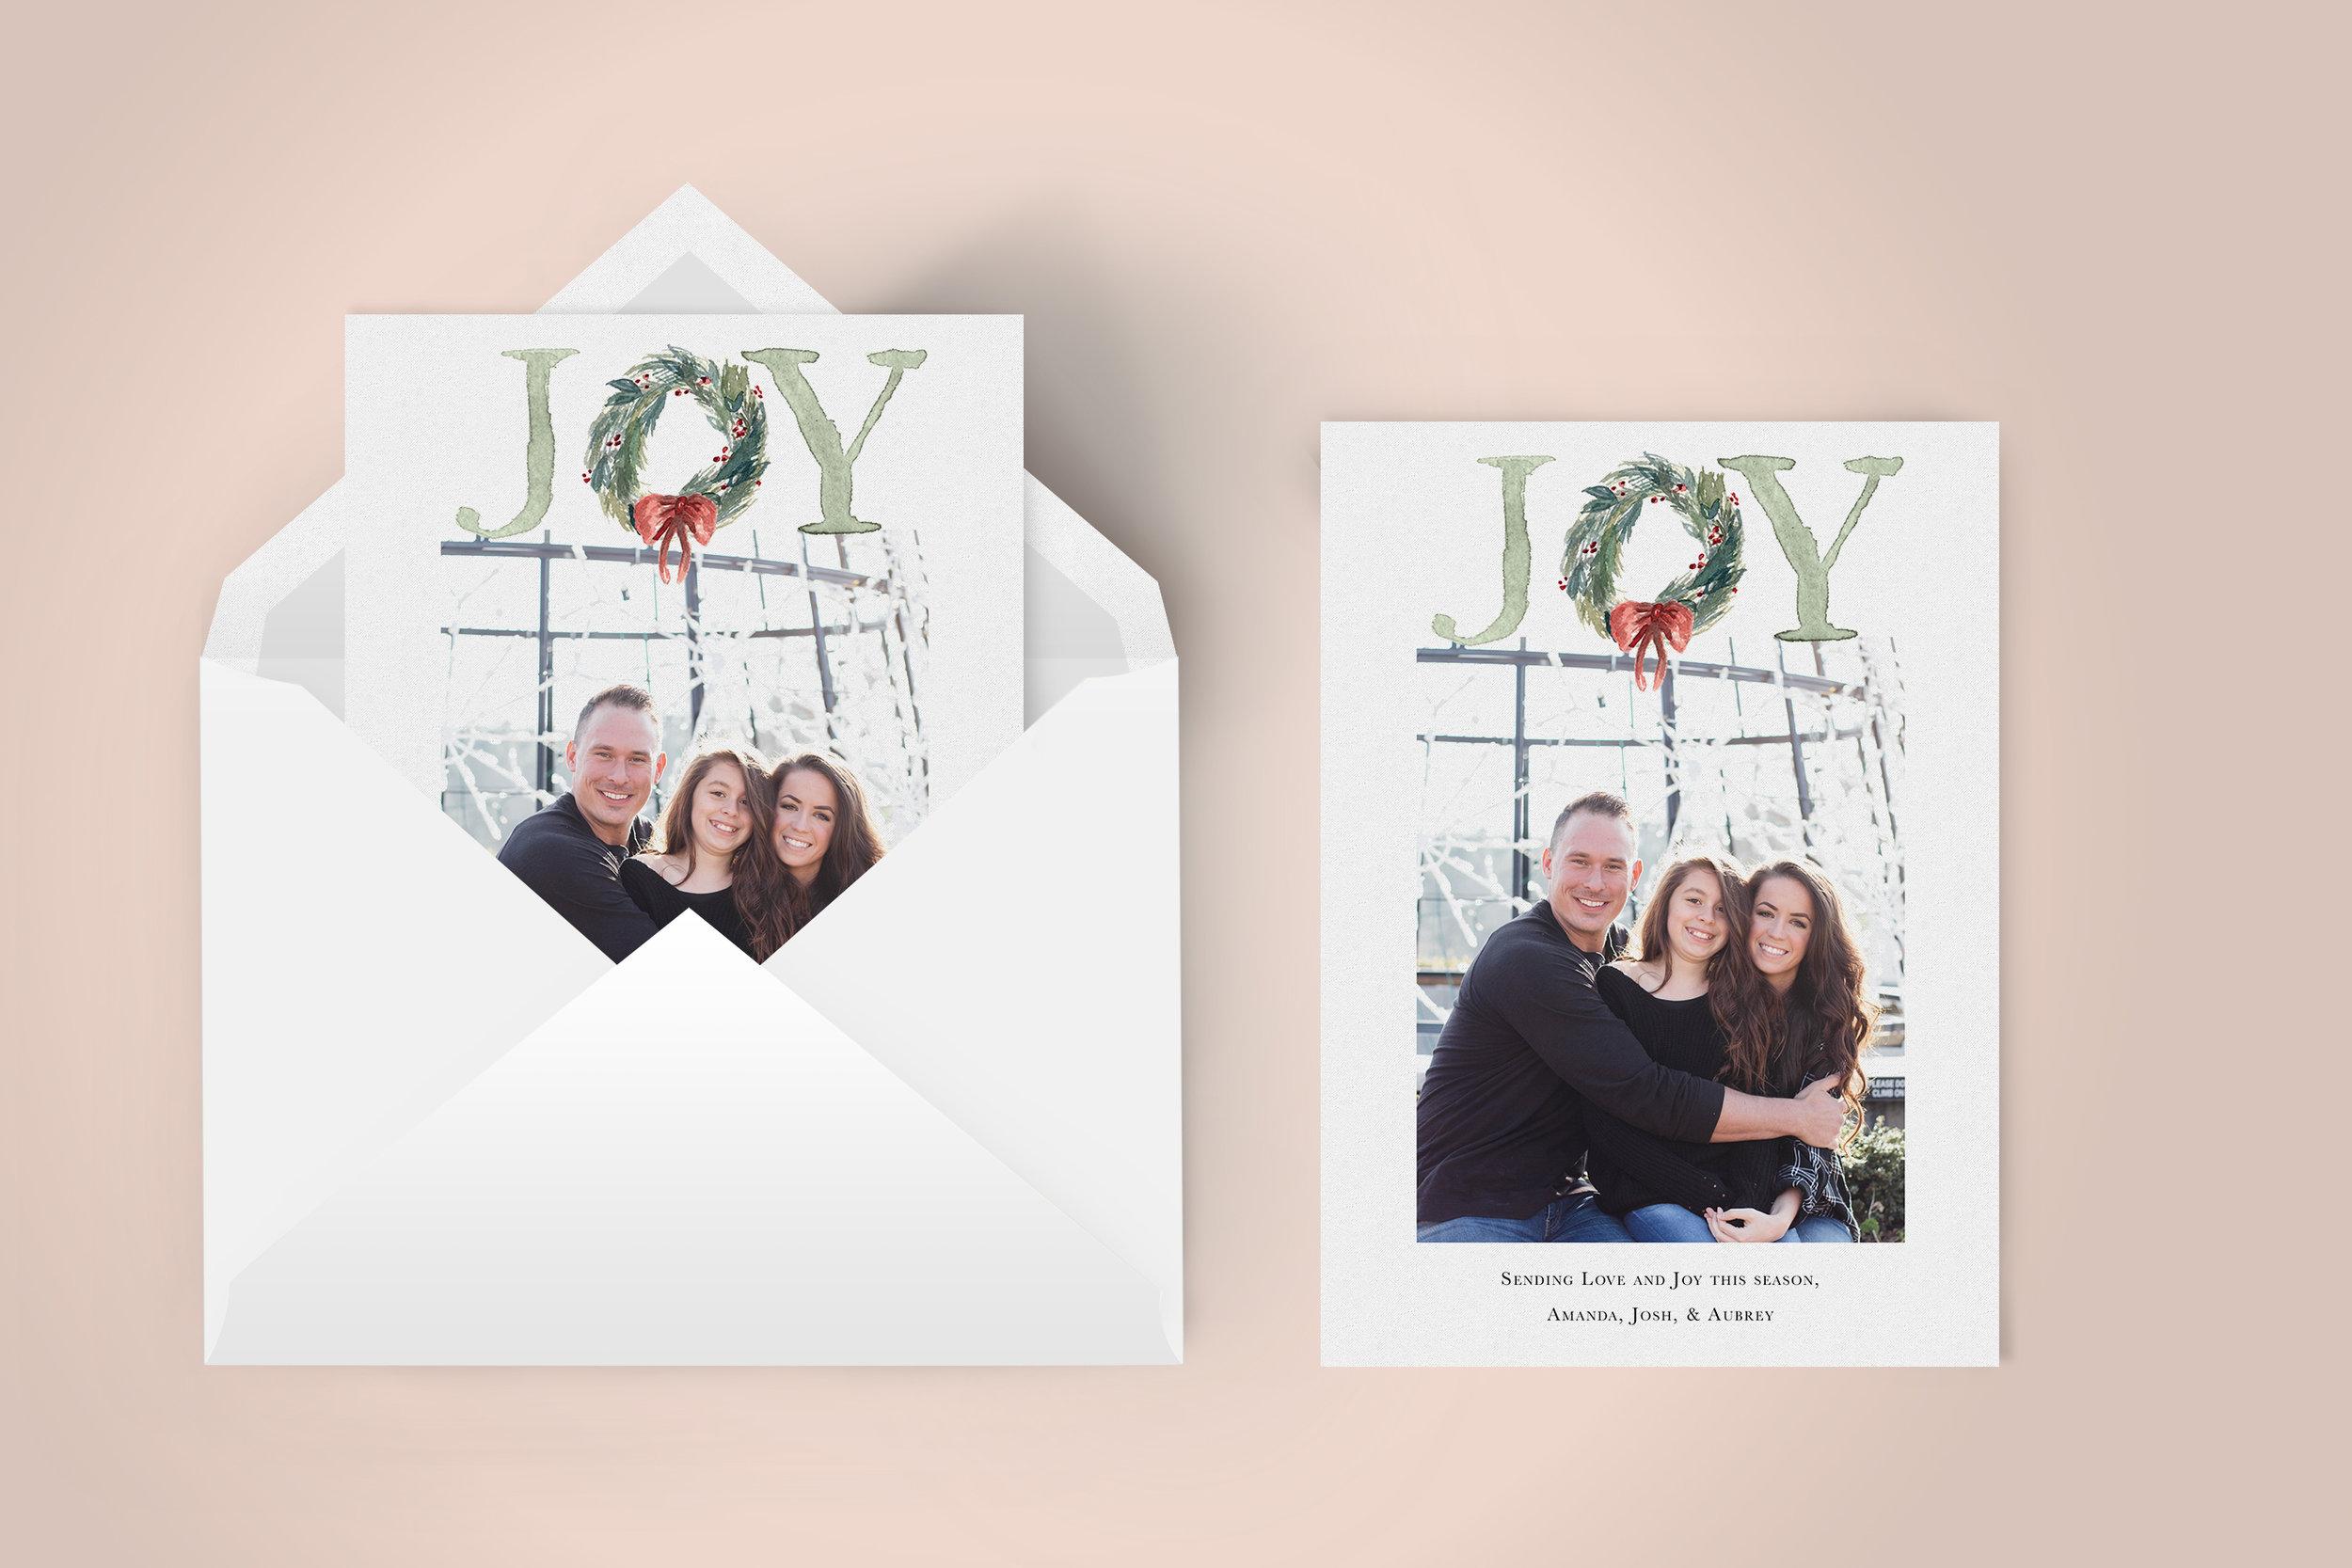 Modern Watercolor JOY with wreath Photo Card | Custom Luxury Wedding | Lauren Antoniaa Calligraphy and Design